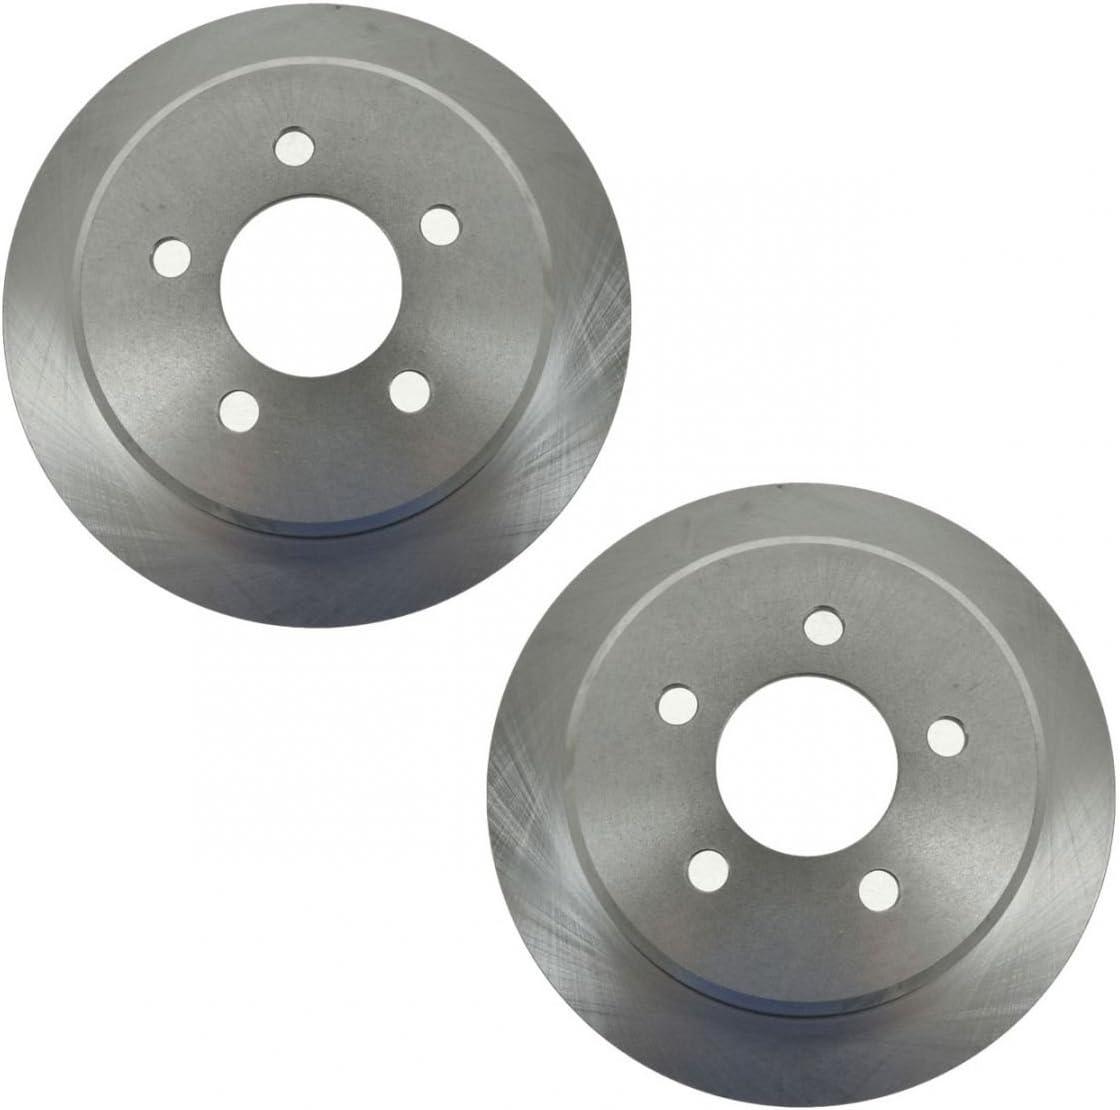 Rear Discs Brake Rotors Pair Set of 2 for 93-98 Jeep Grand Cherokee